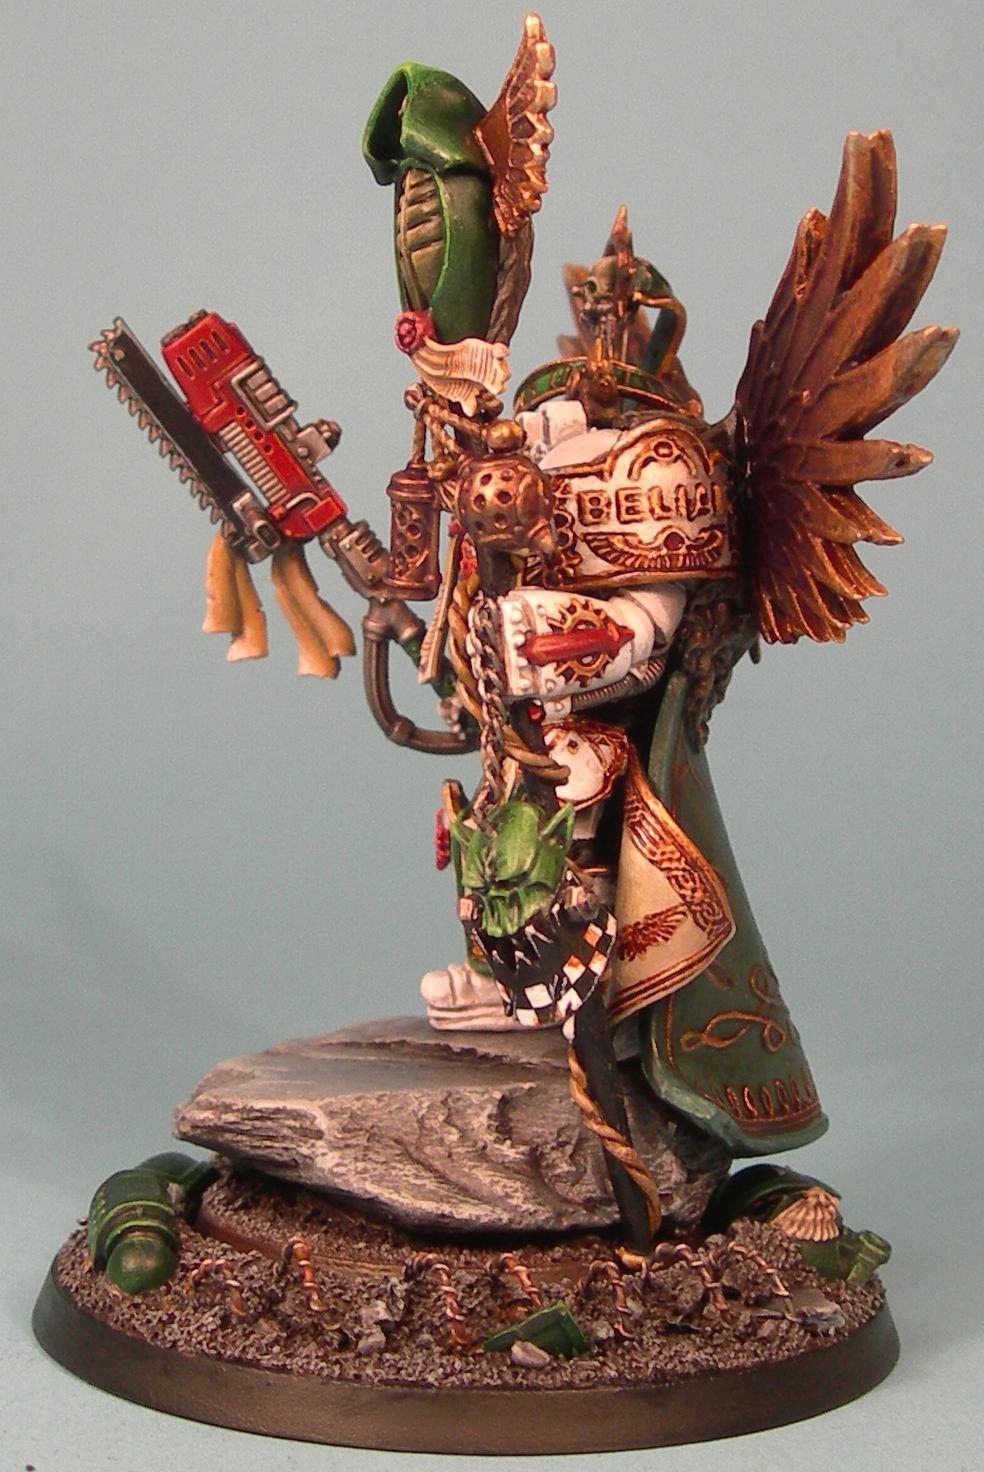 Belial, Conversion, Dark Angels, Pro Painted, Space Marines, Terminator Armor